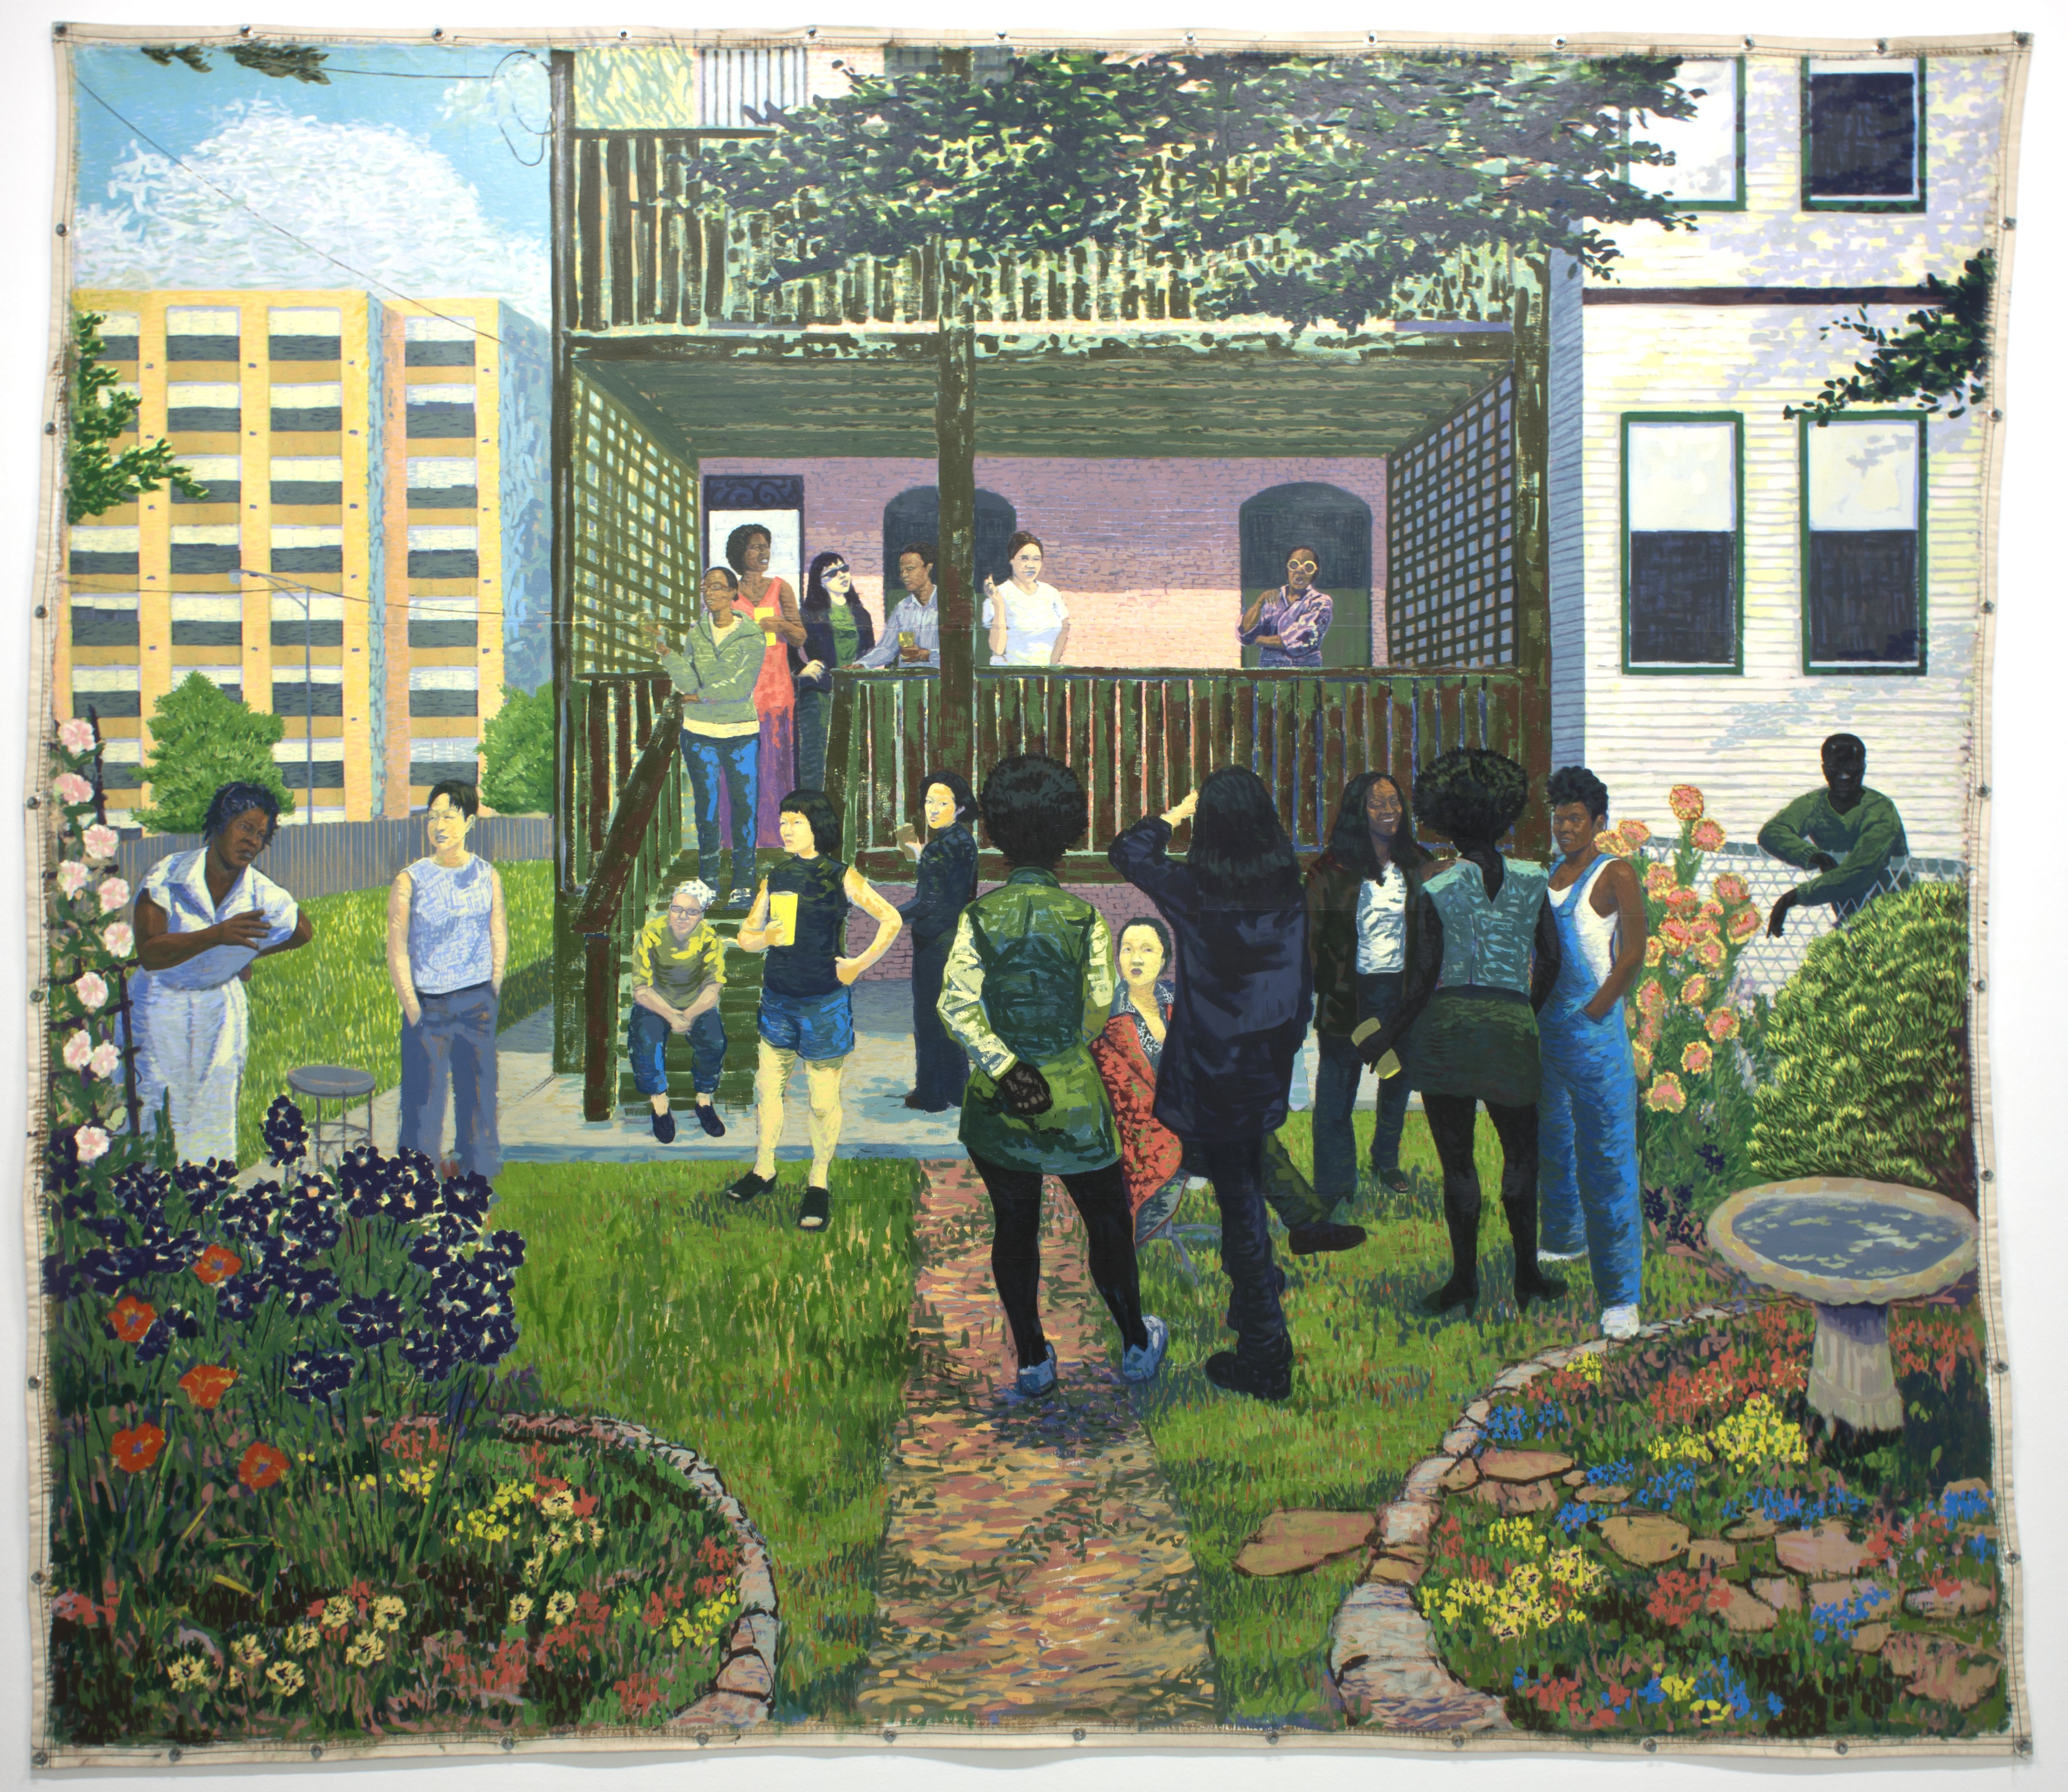 Kerry James Marshall at Kunsthal Charlottenborg (Contemporary Art ...